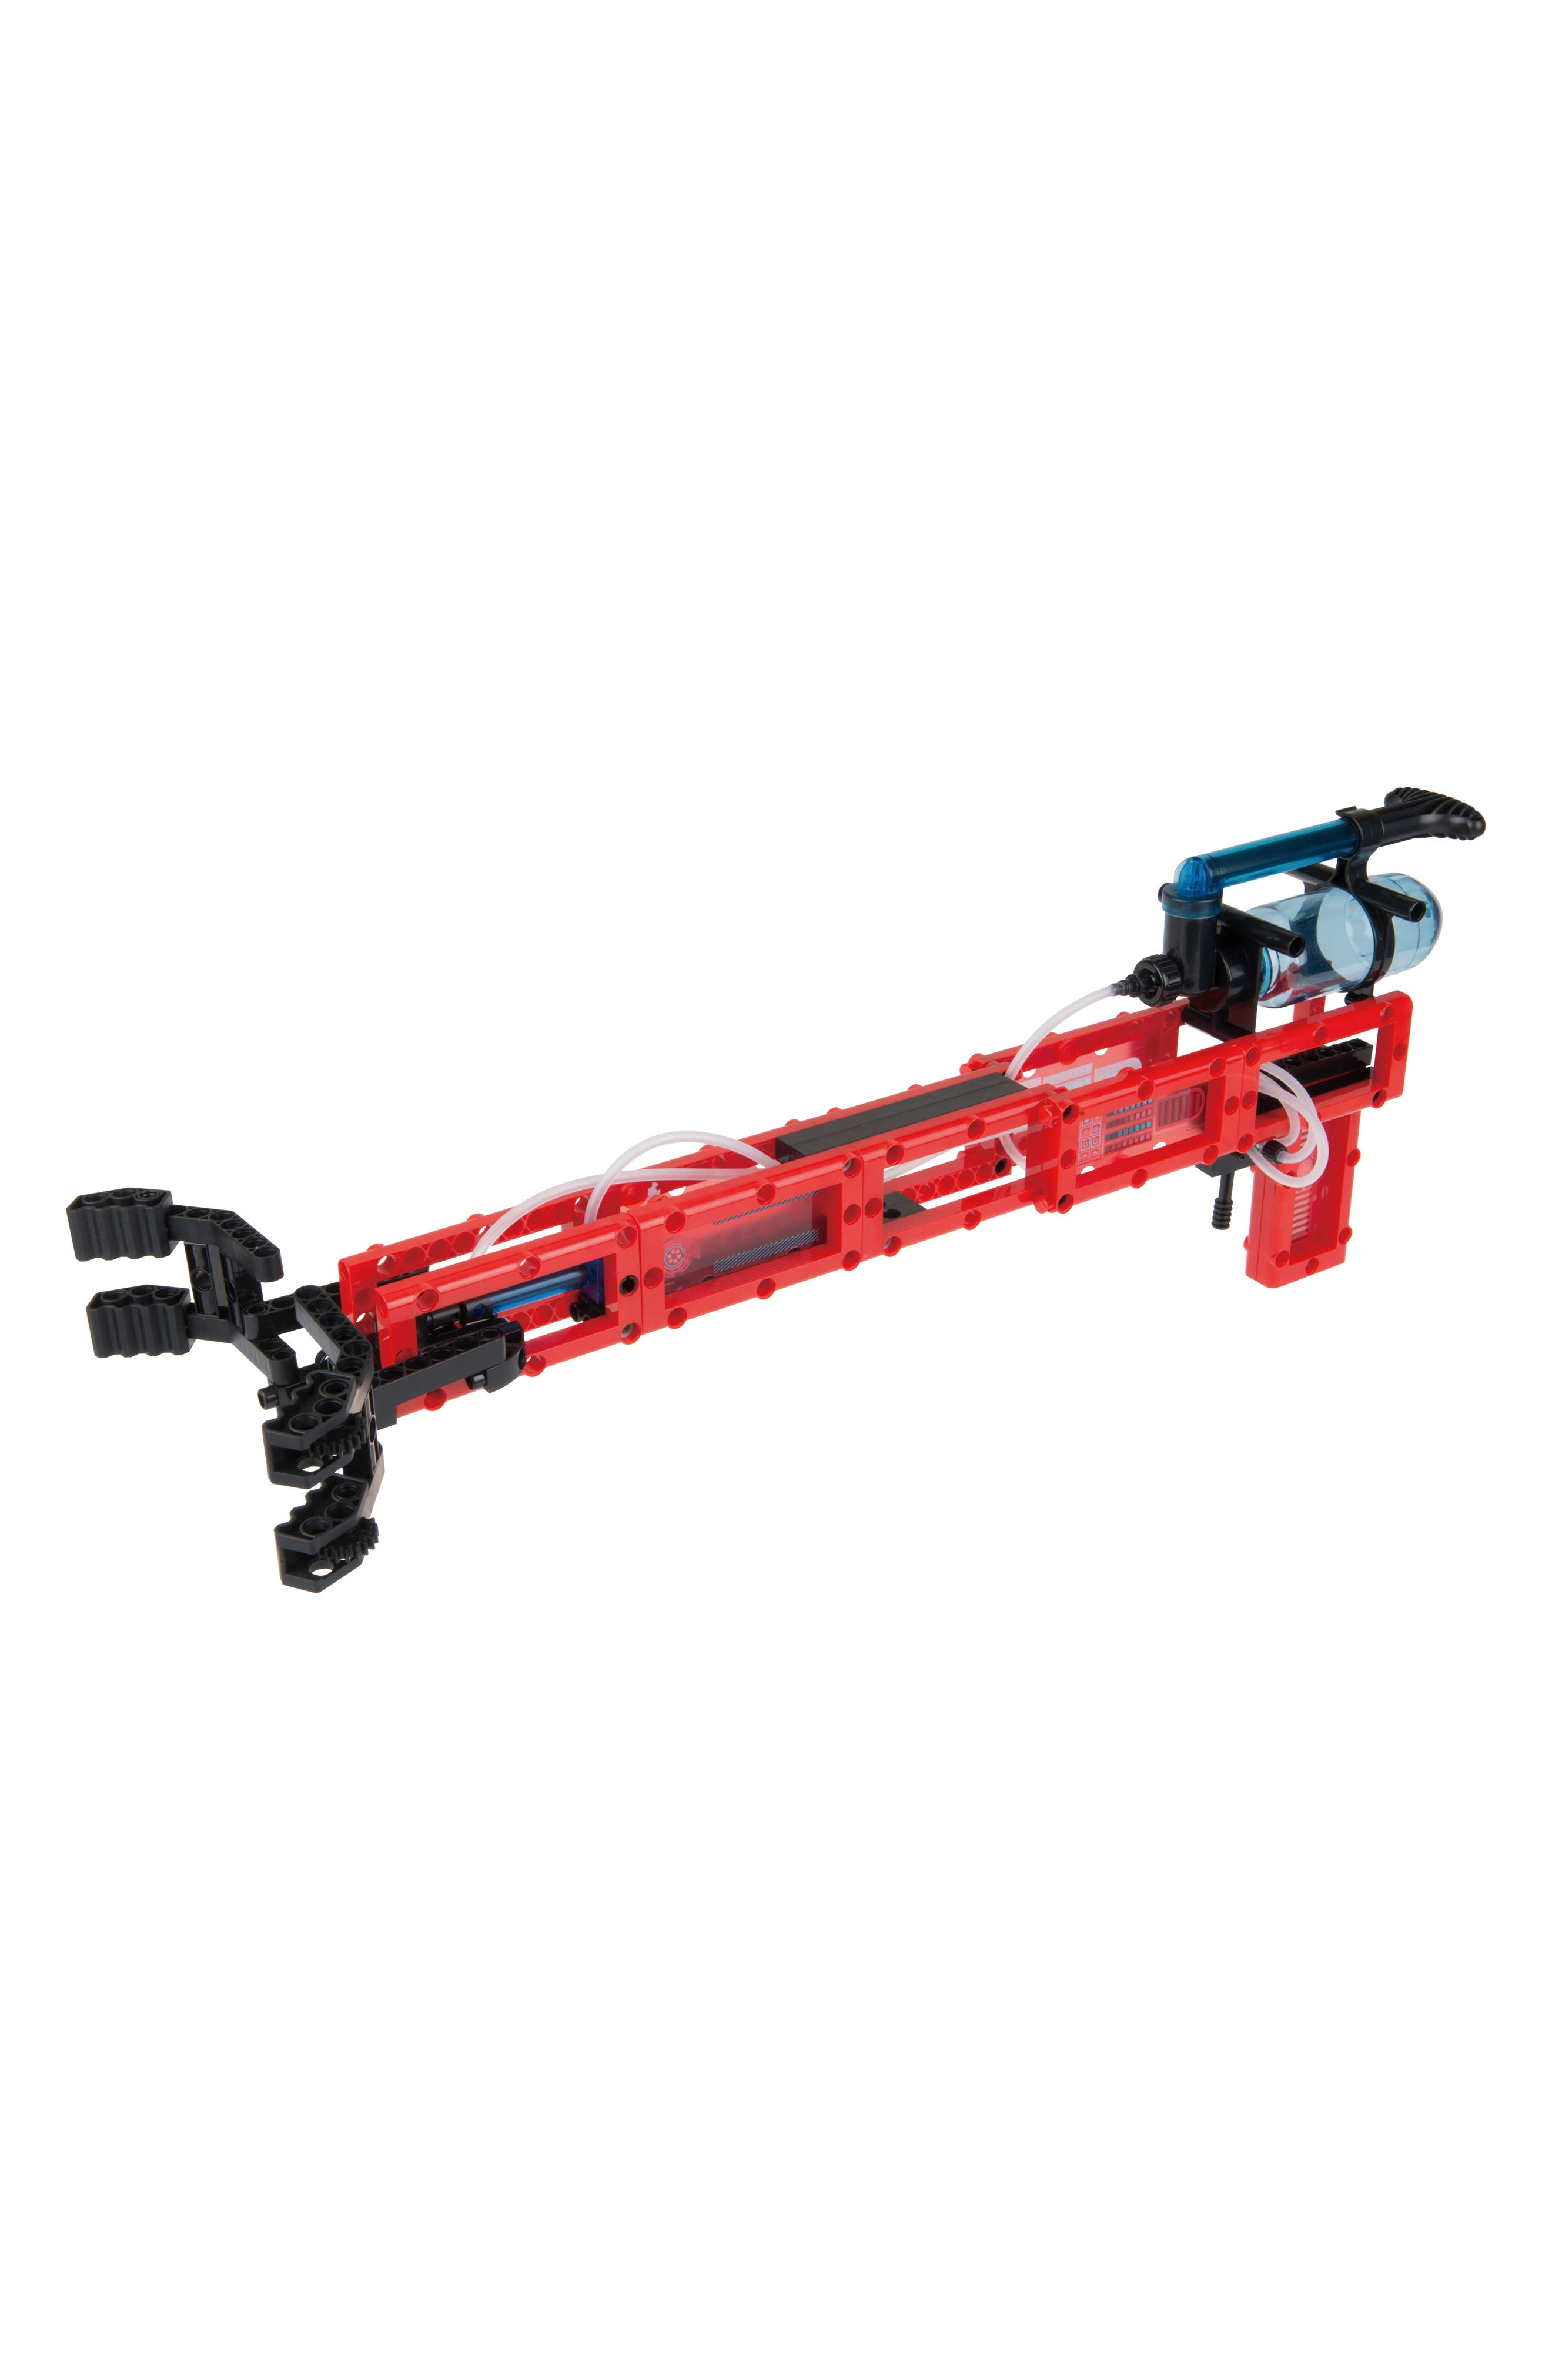 Mechanical Engineering Robotic Arms Kit,                             Alternate thumbnail 8, color,                             MULTI